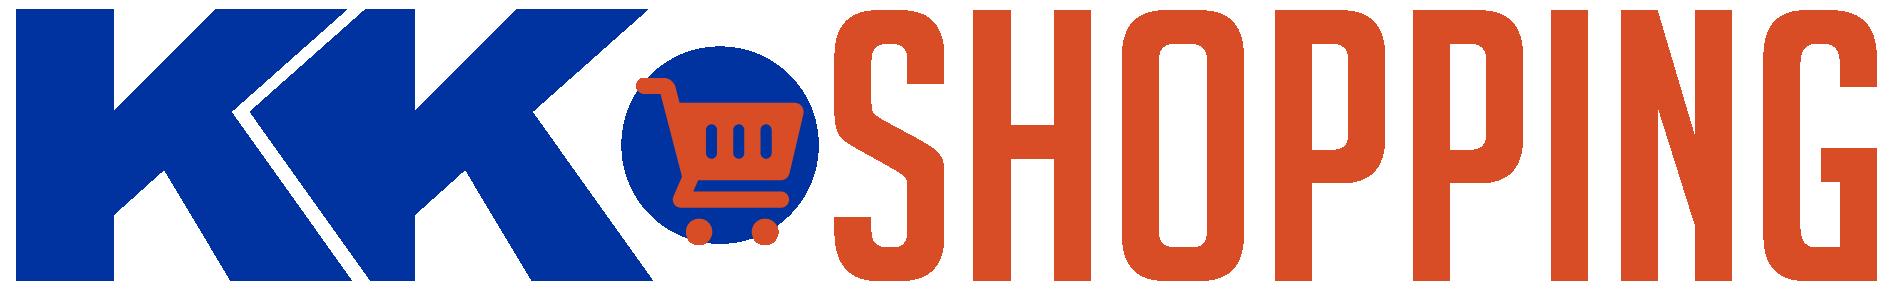 logo kkshopping